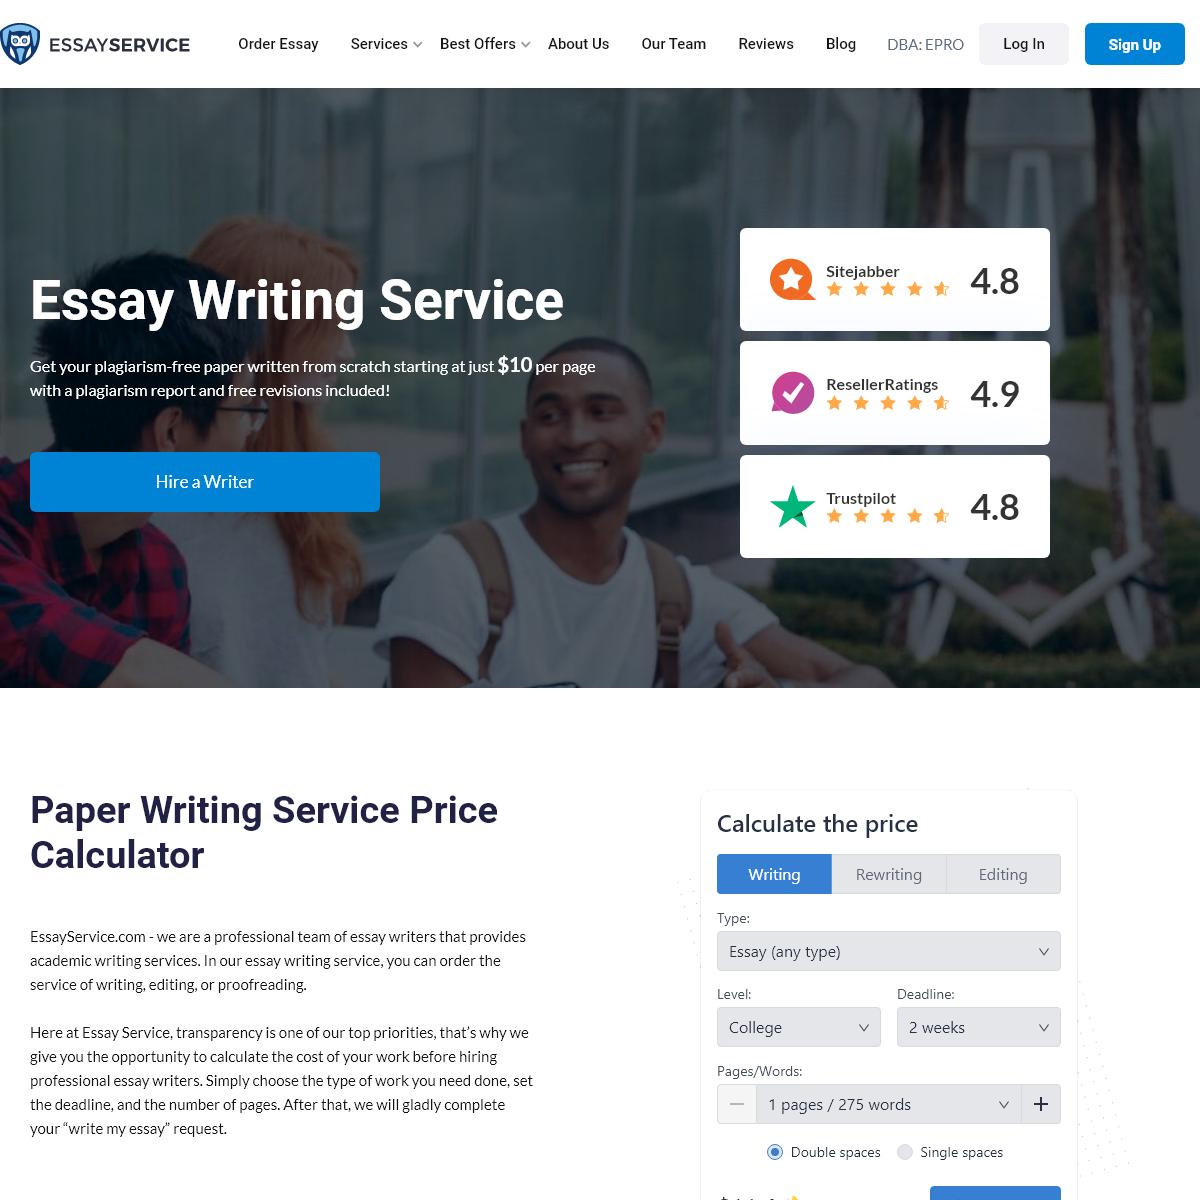 Essay Writing Service. Hire a Best Essay Writer Online!